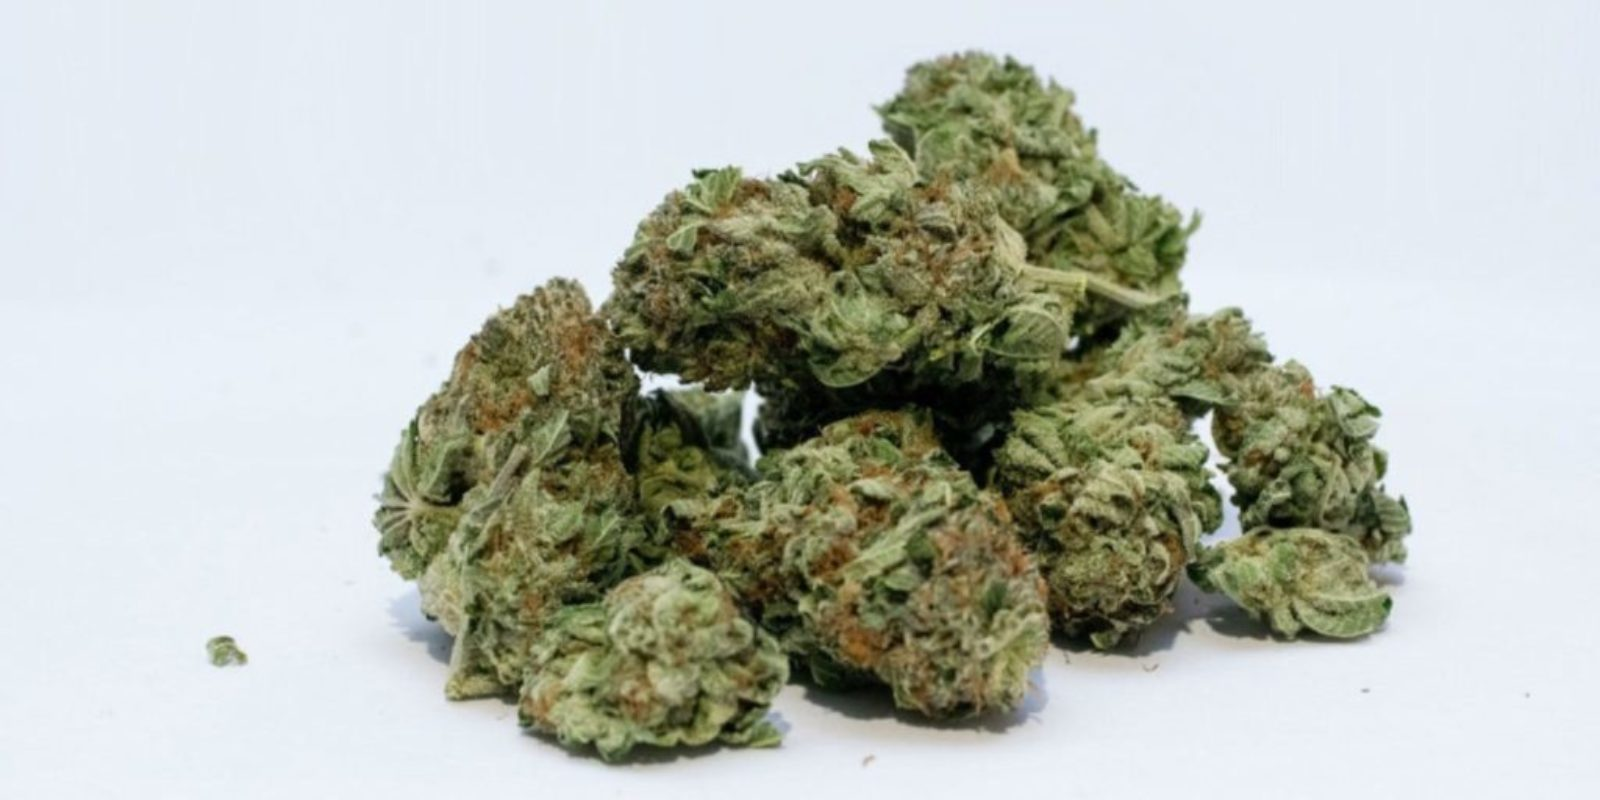 Marijuana balls in a pile.